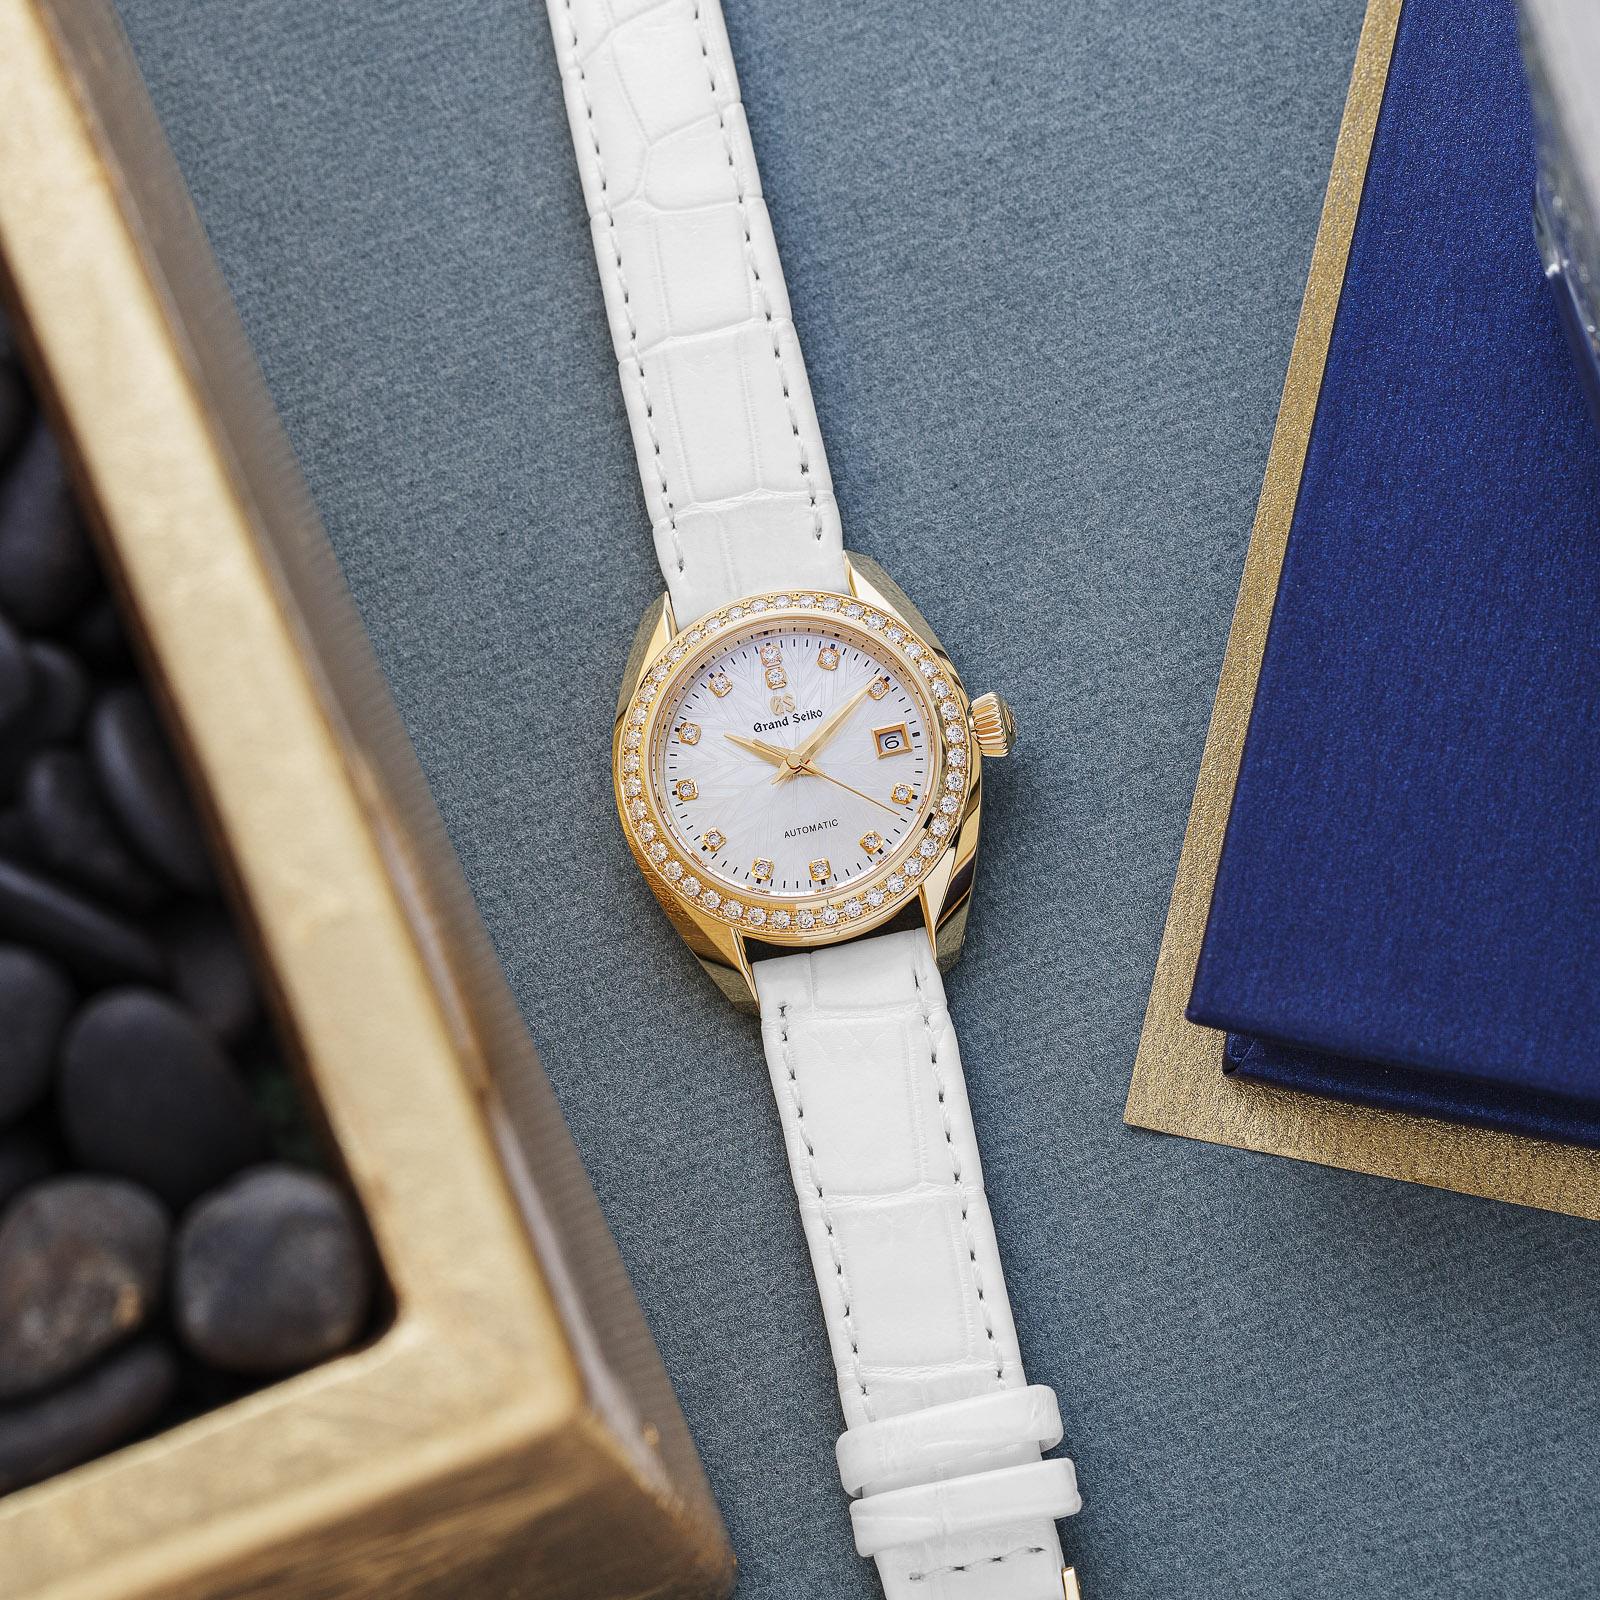 Grand Seiko wristwatch STGK004 - white dial, gold case on a white strap atop a table.